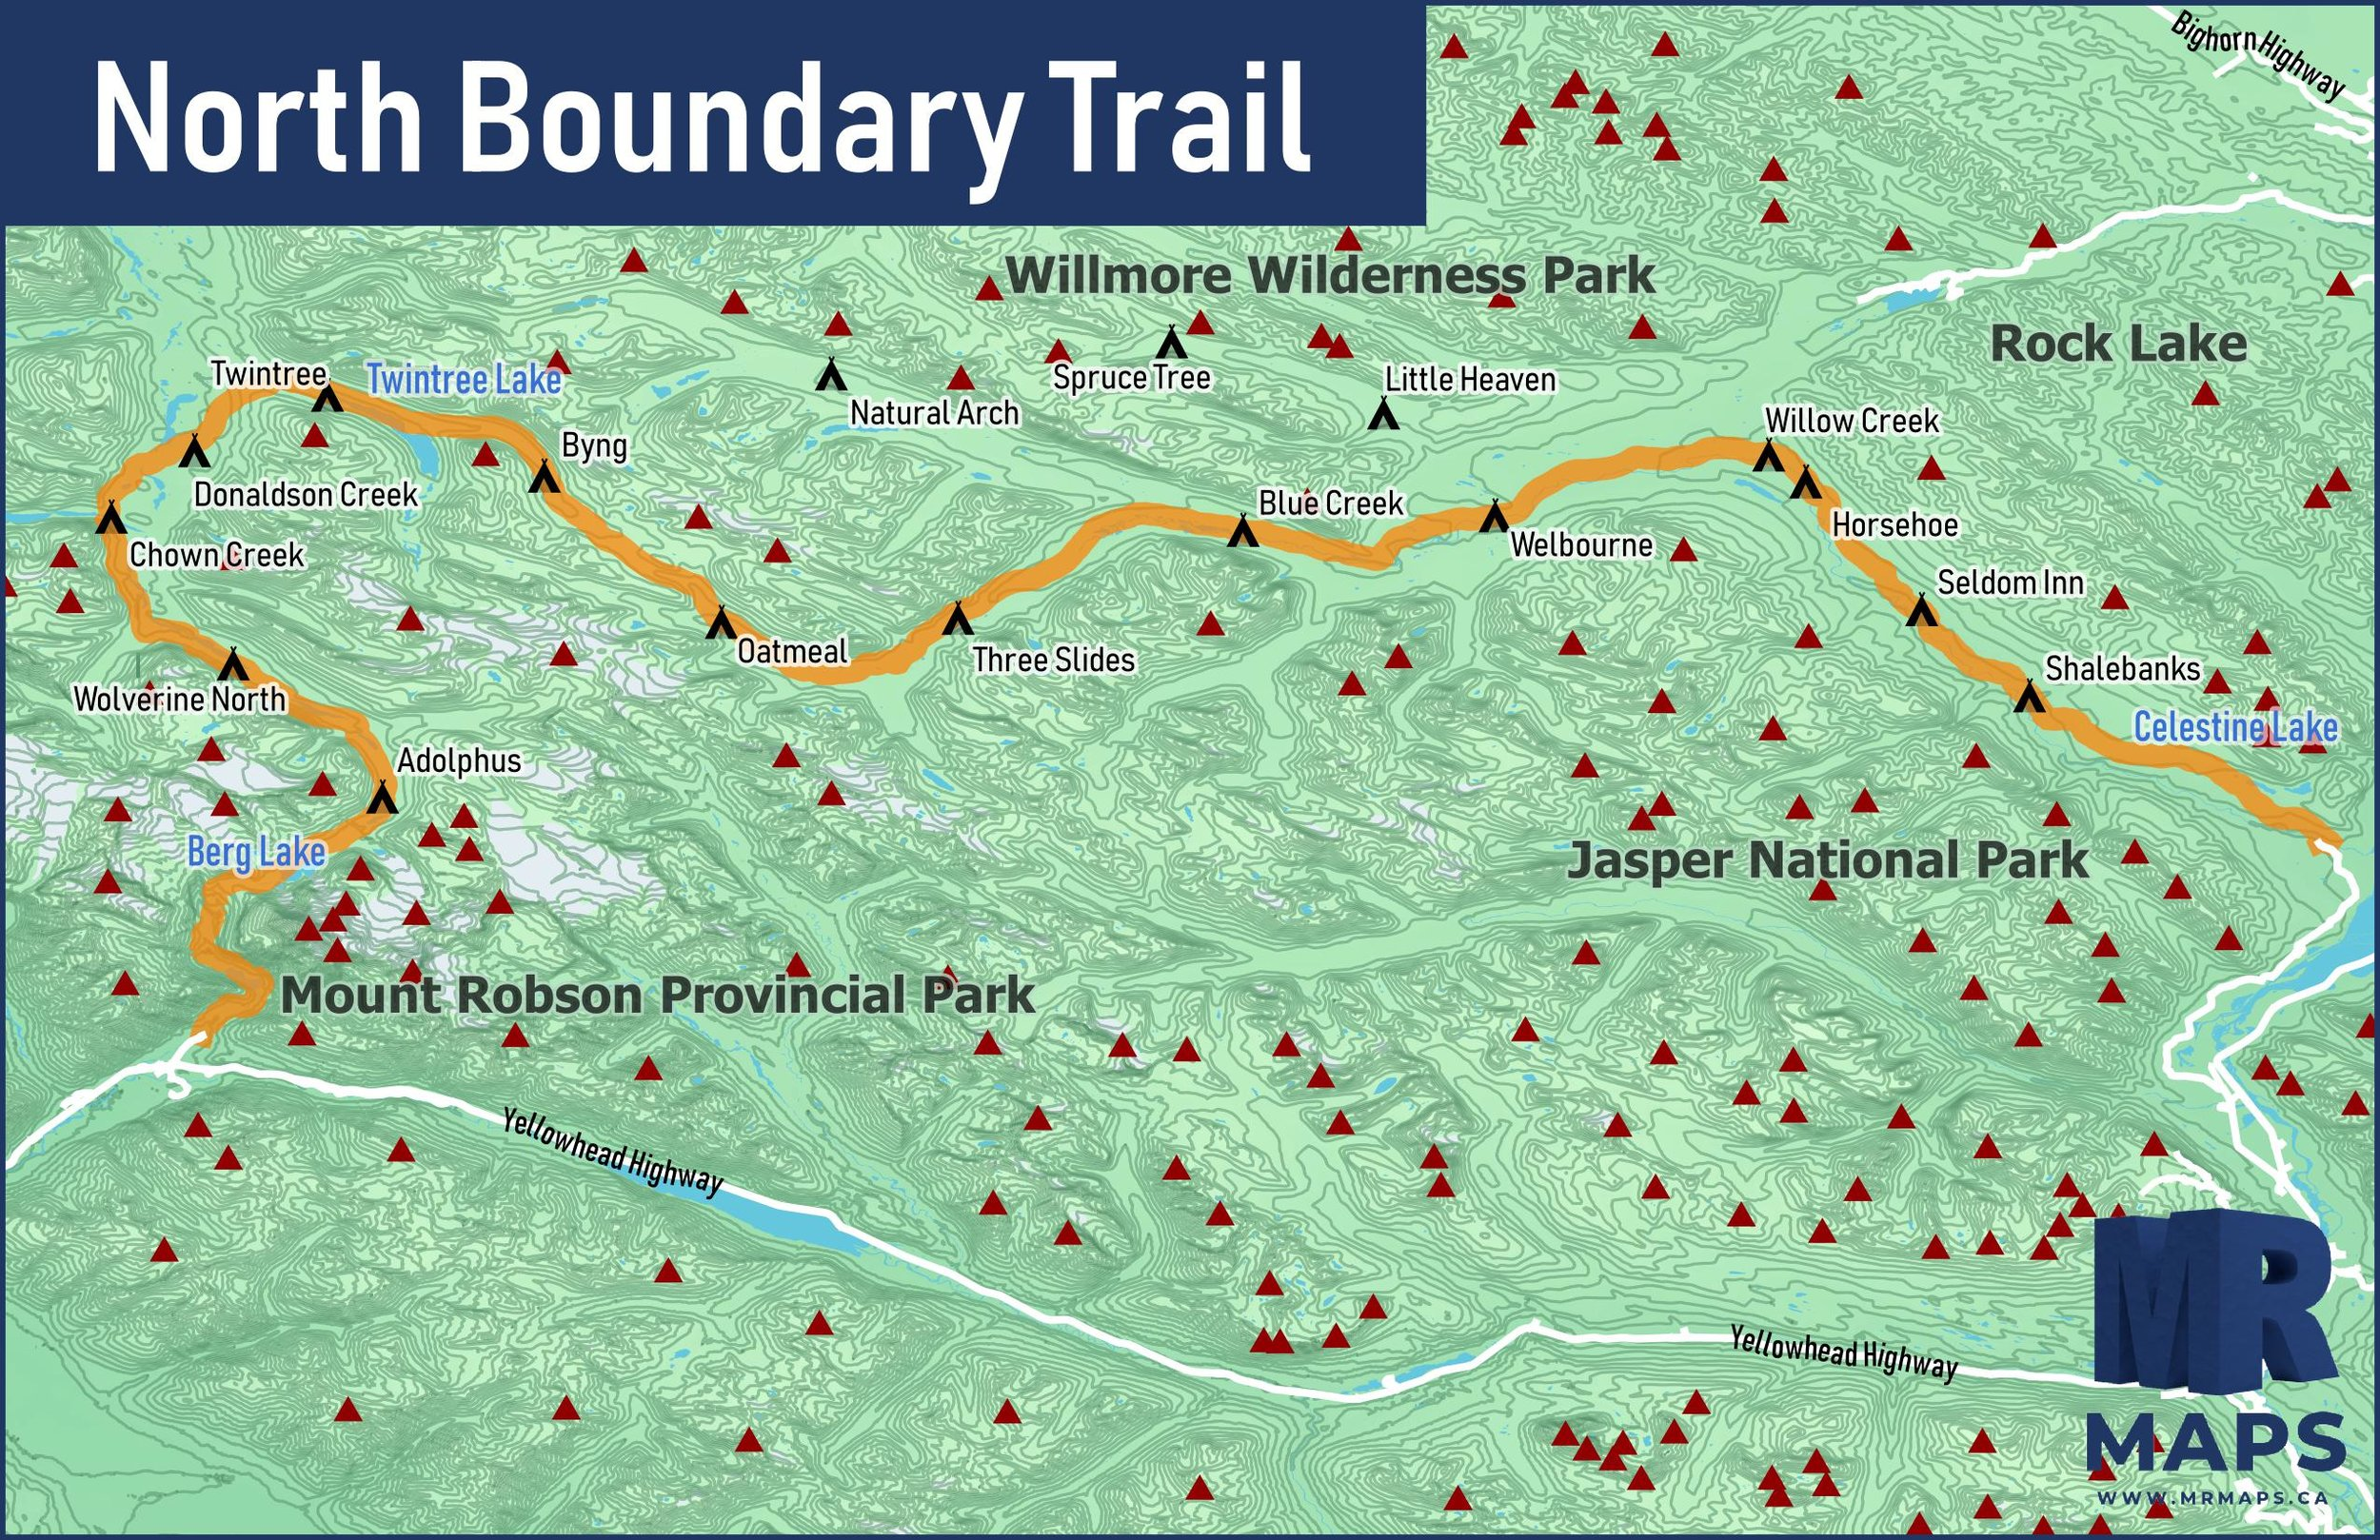 NorthBoundaryTrail-SummaryMap.jpg